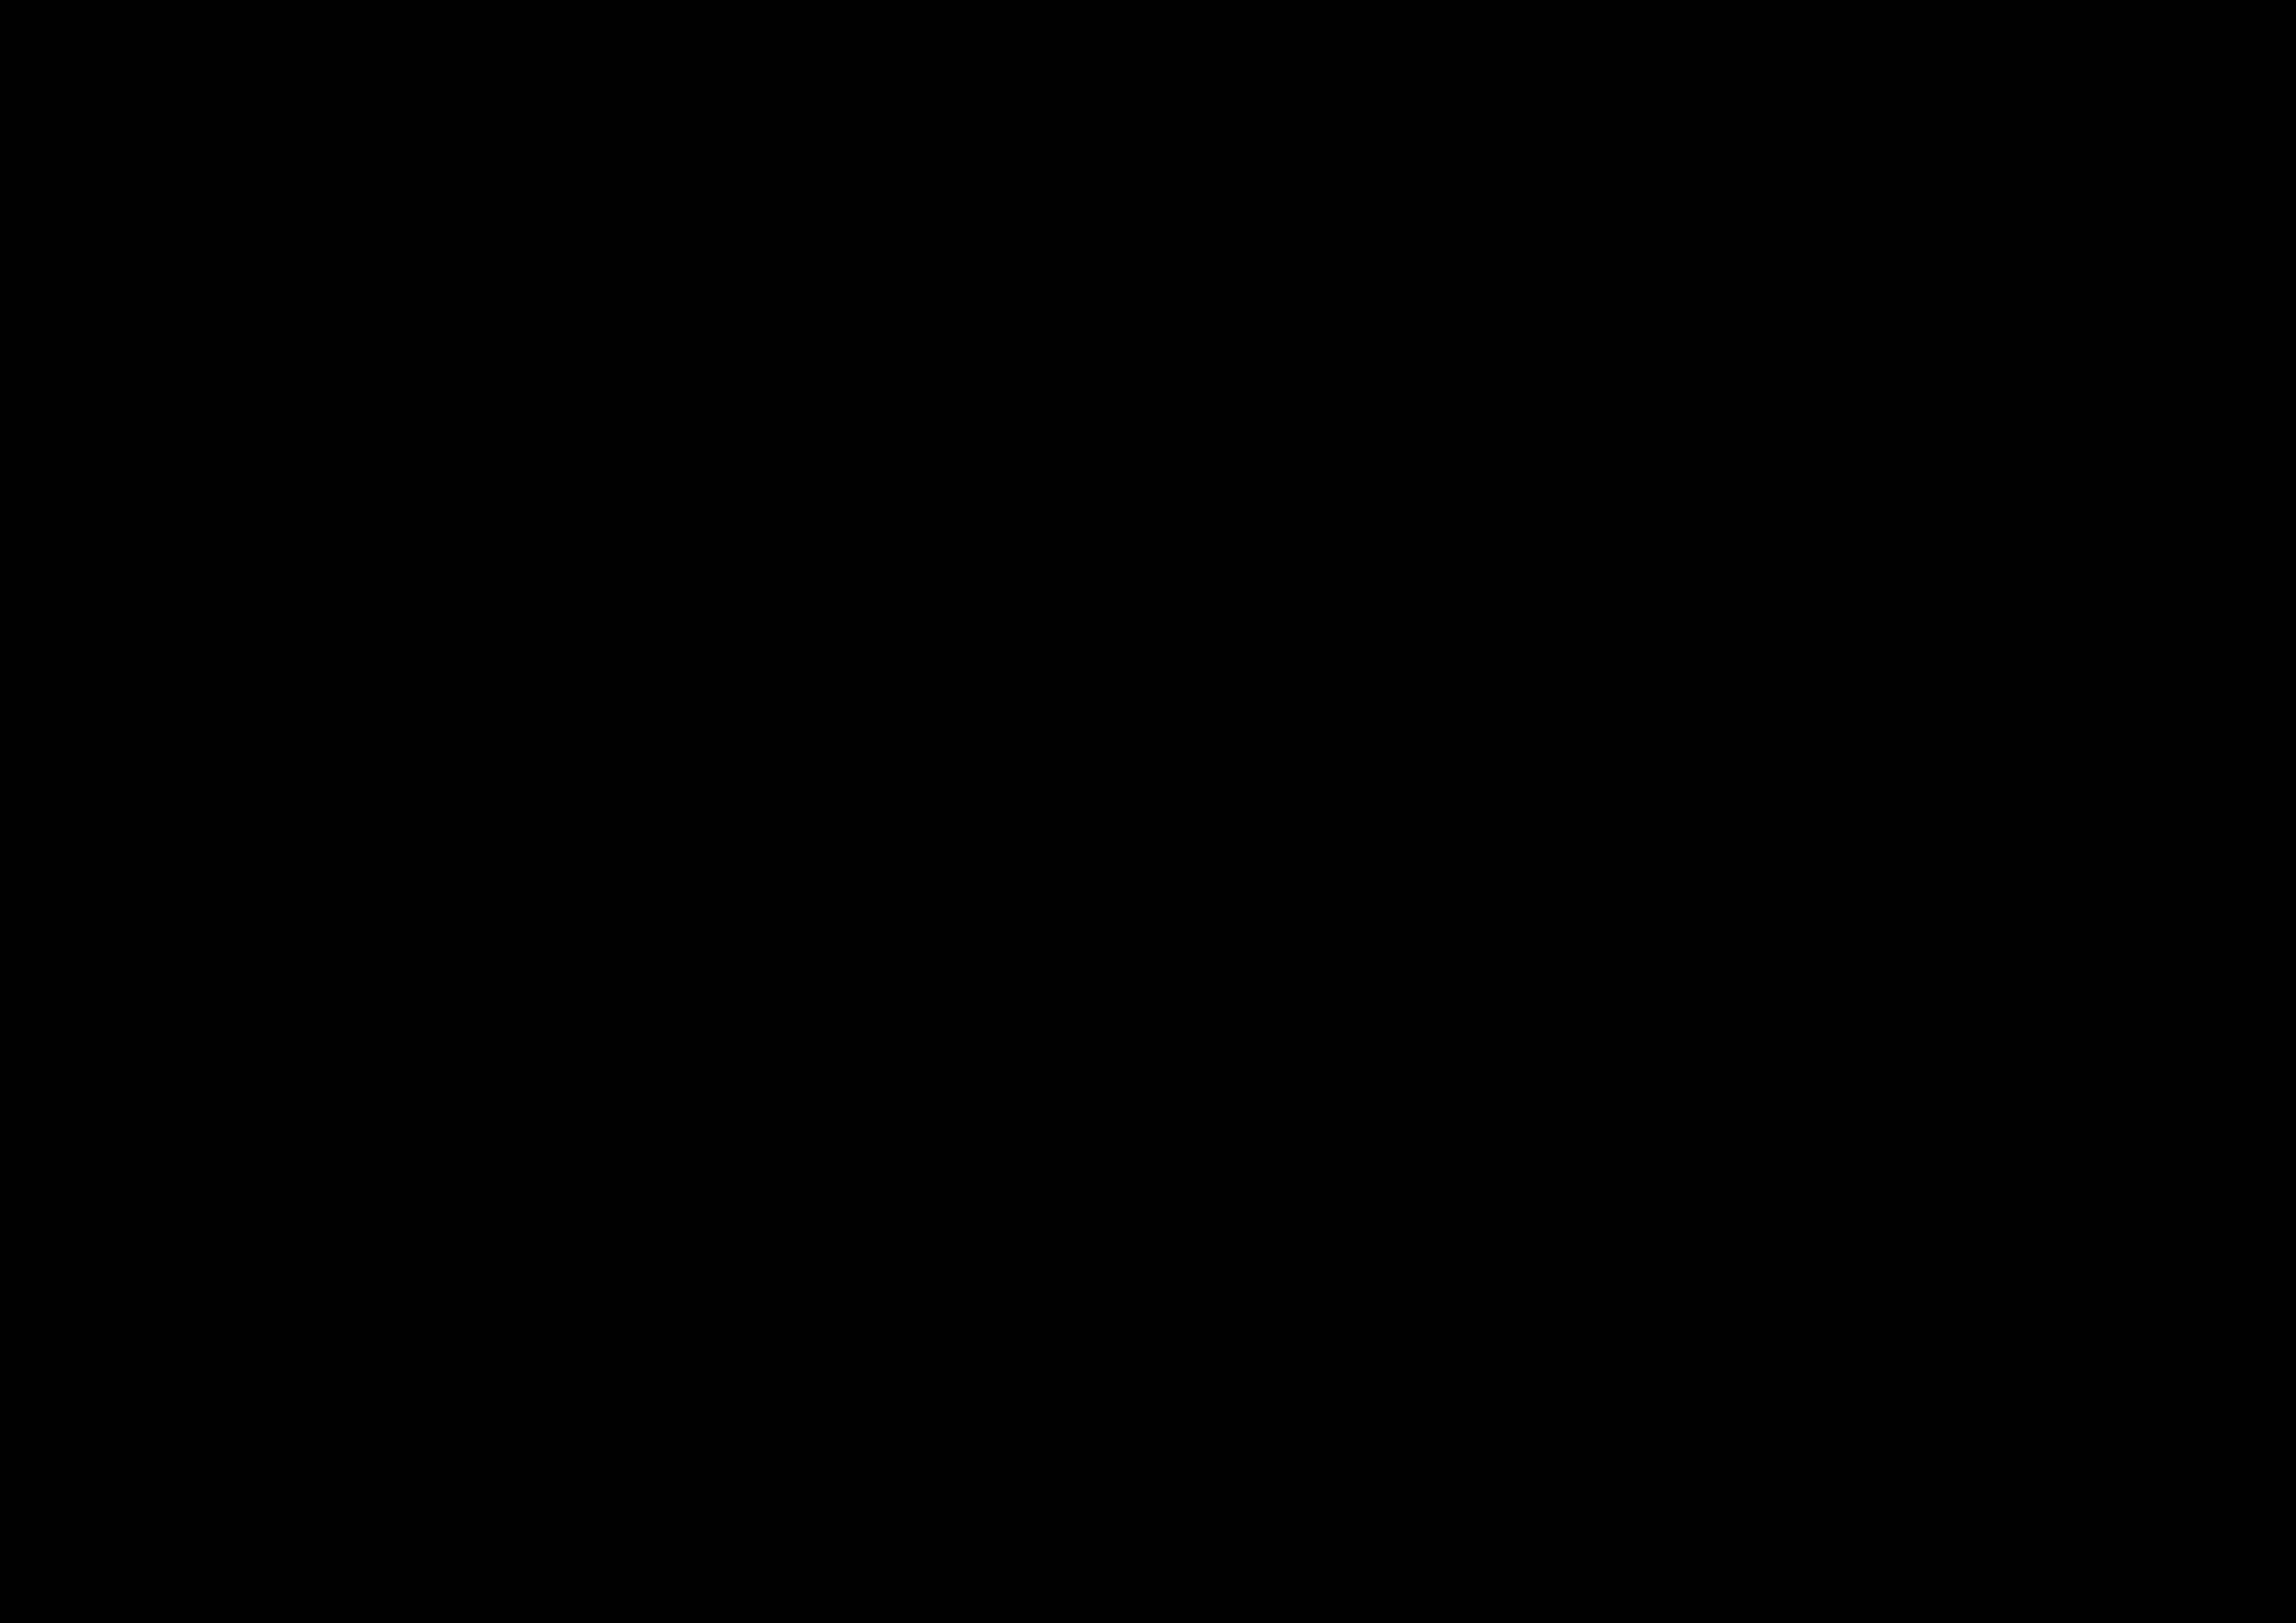 Clipart dolphin dolphin miami logo. Page of clipartblack com